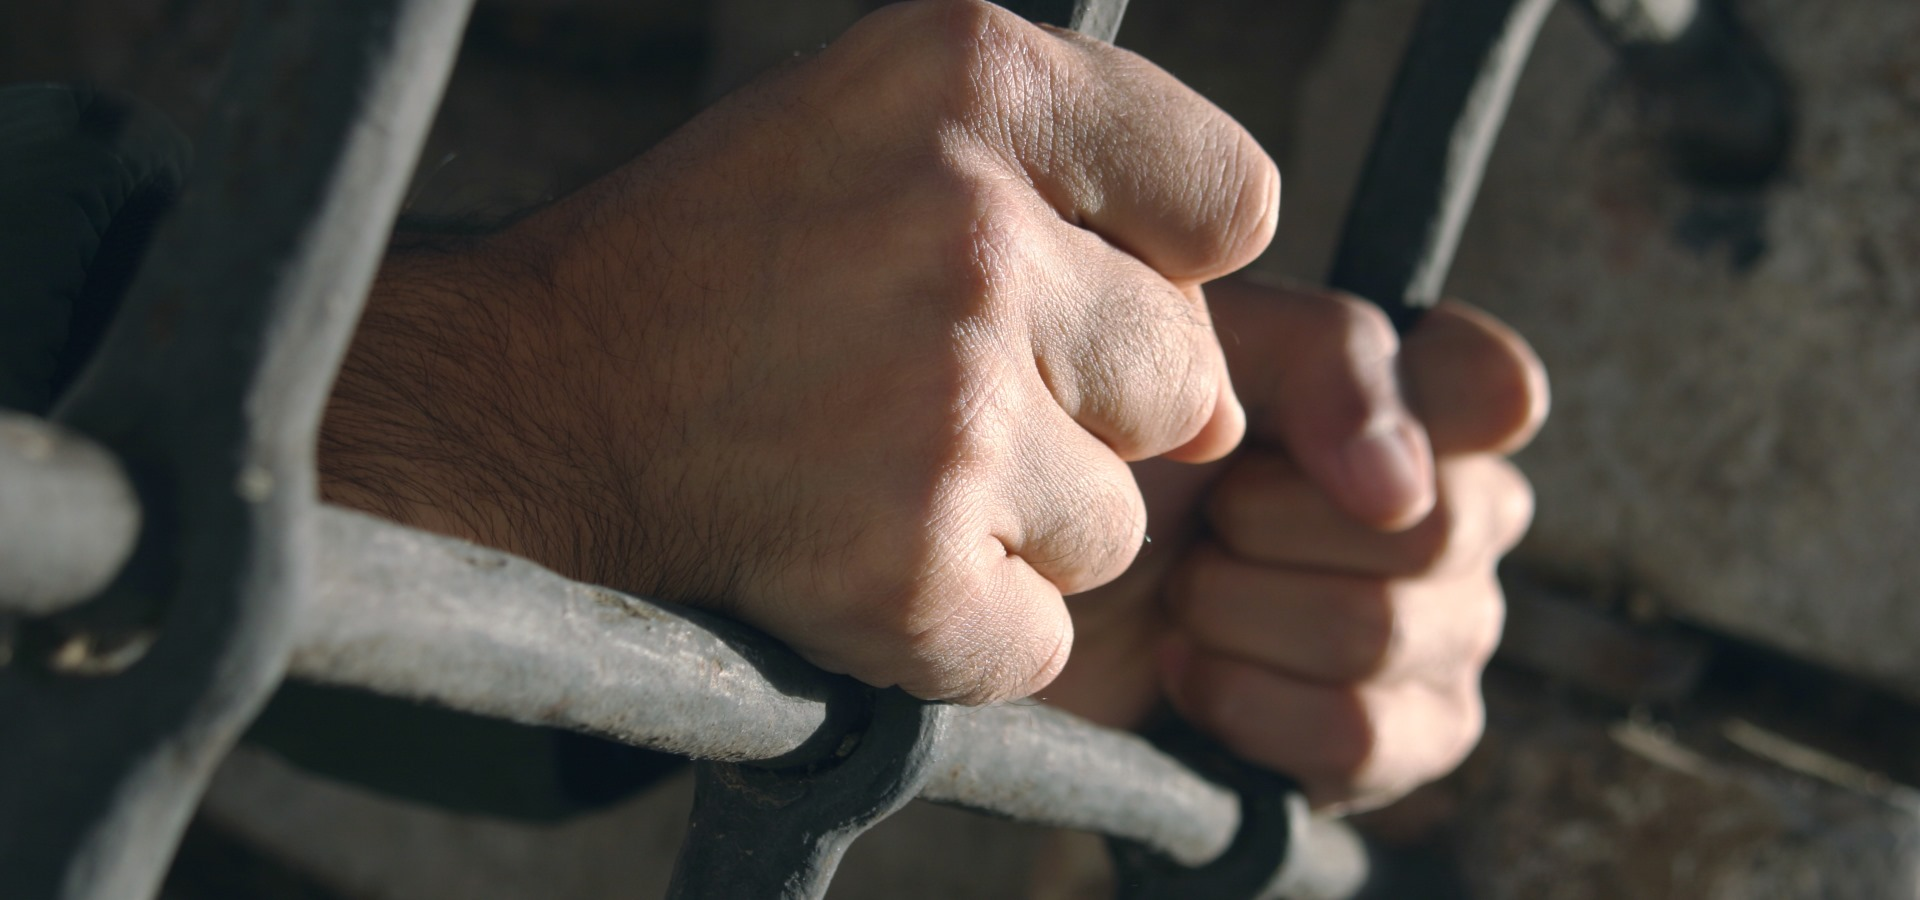 hands grabbing prison bars